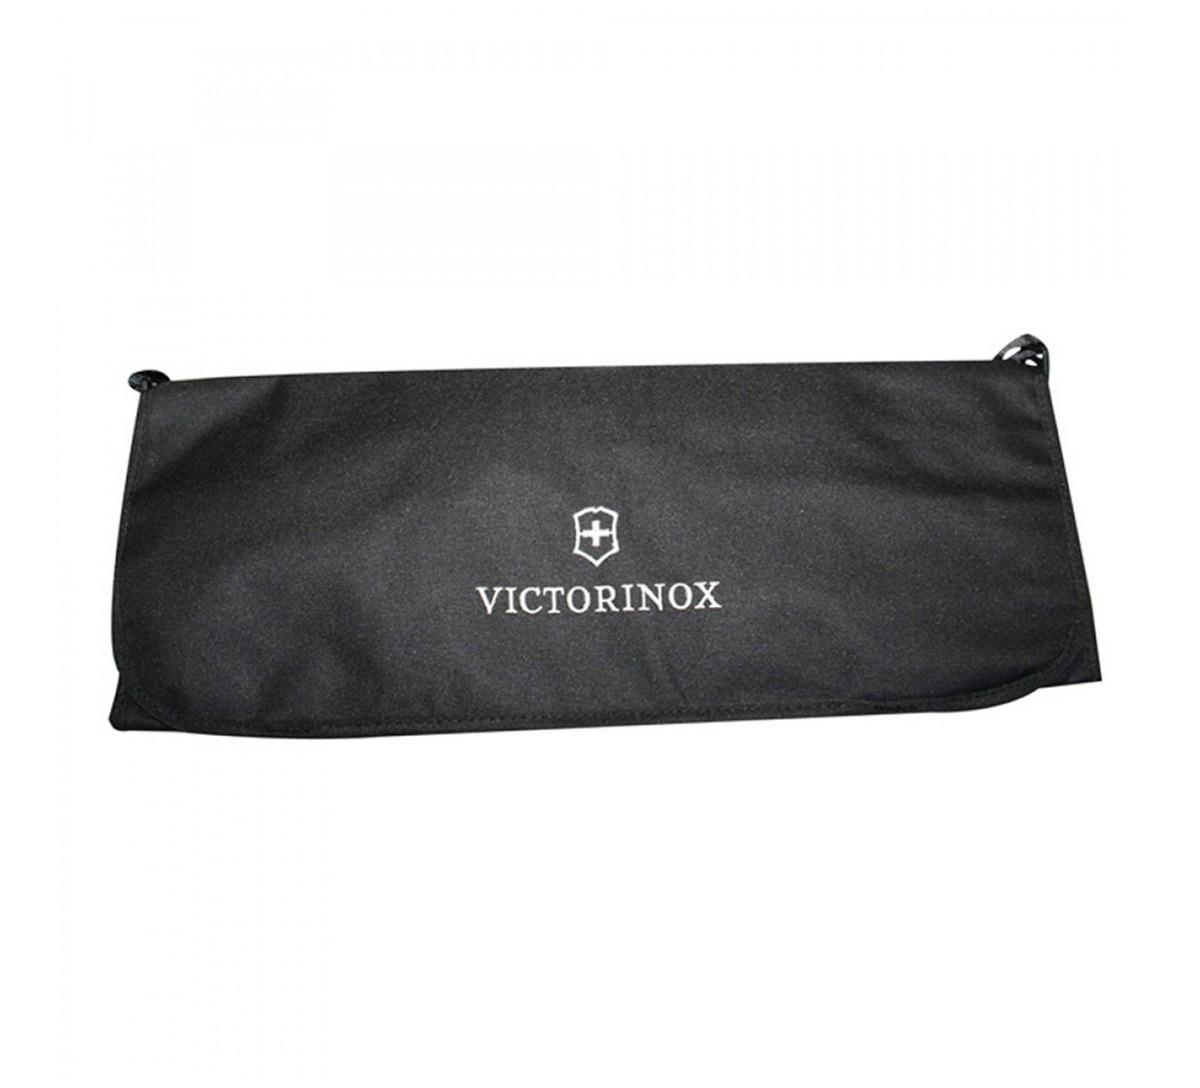 Funda porta cuchillos reforzado victorinox 500837 en mercado libre - Fundas para cuchillos de cocina ...